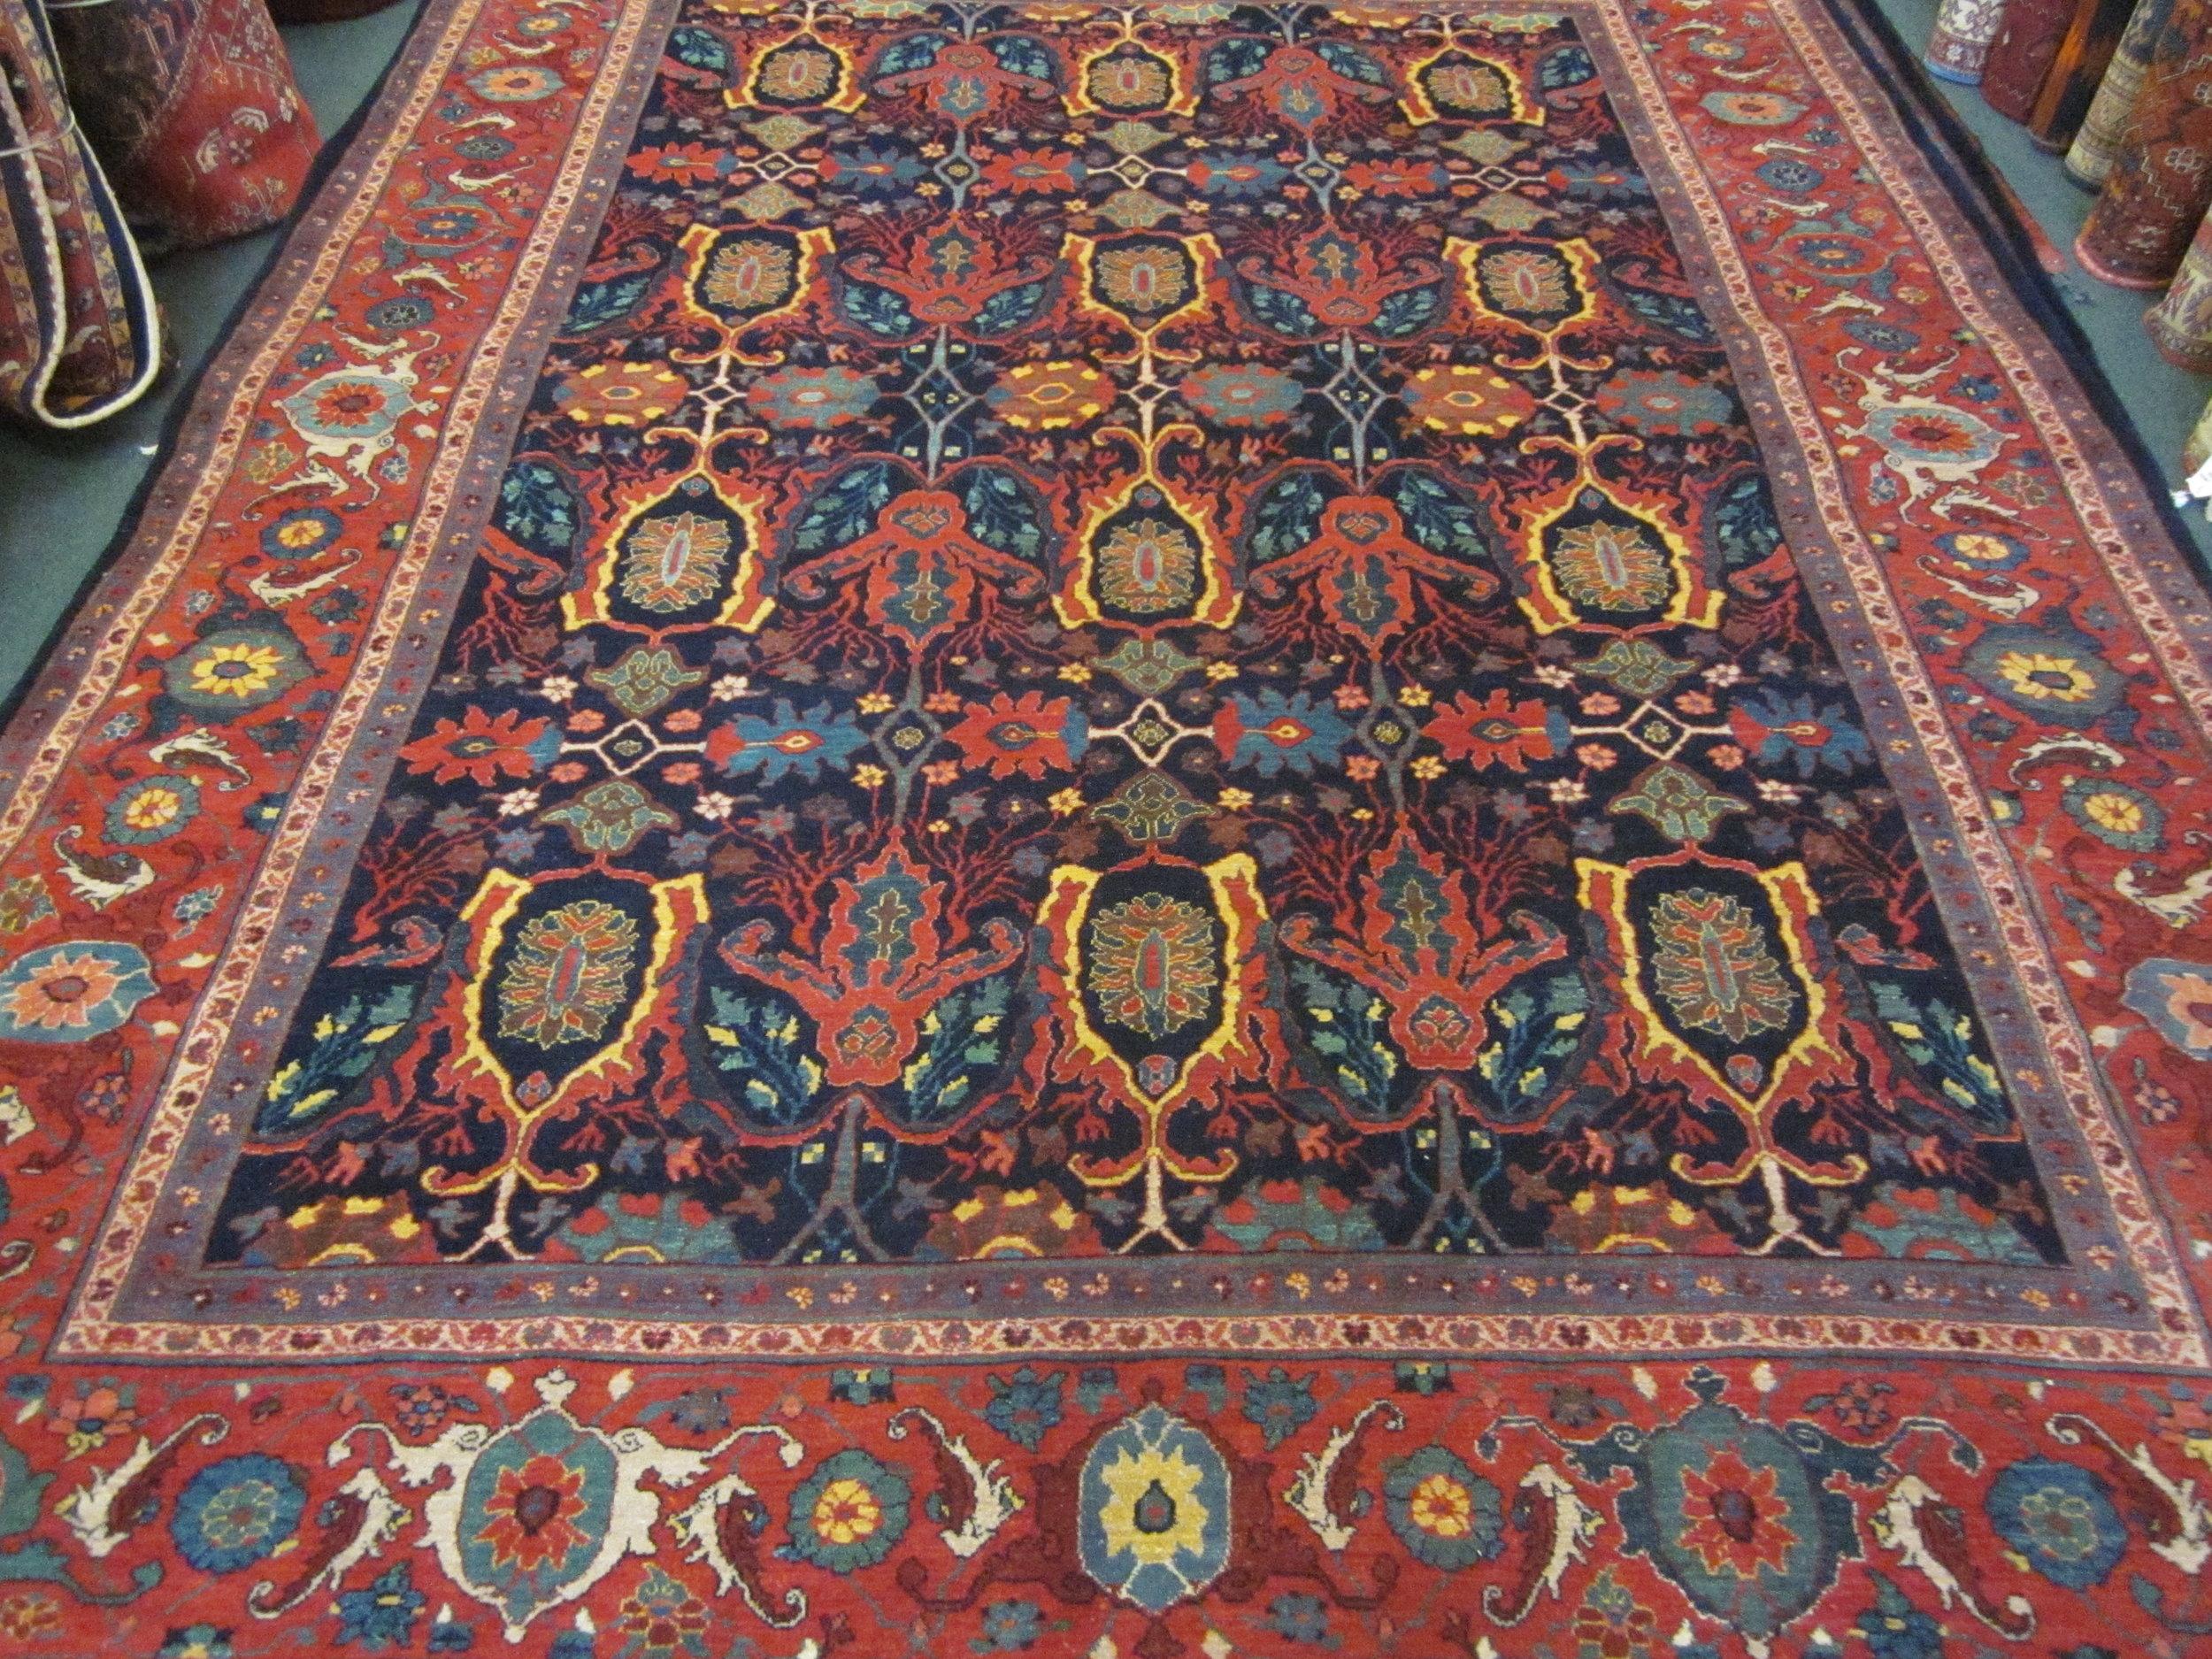 Photo: Beautiful new 8 x 11 Bijar rug in an antique design woven in Iran